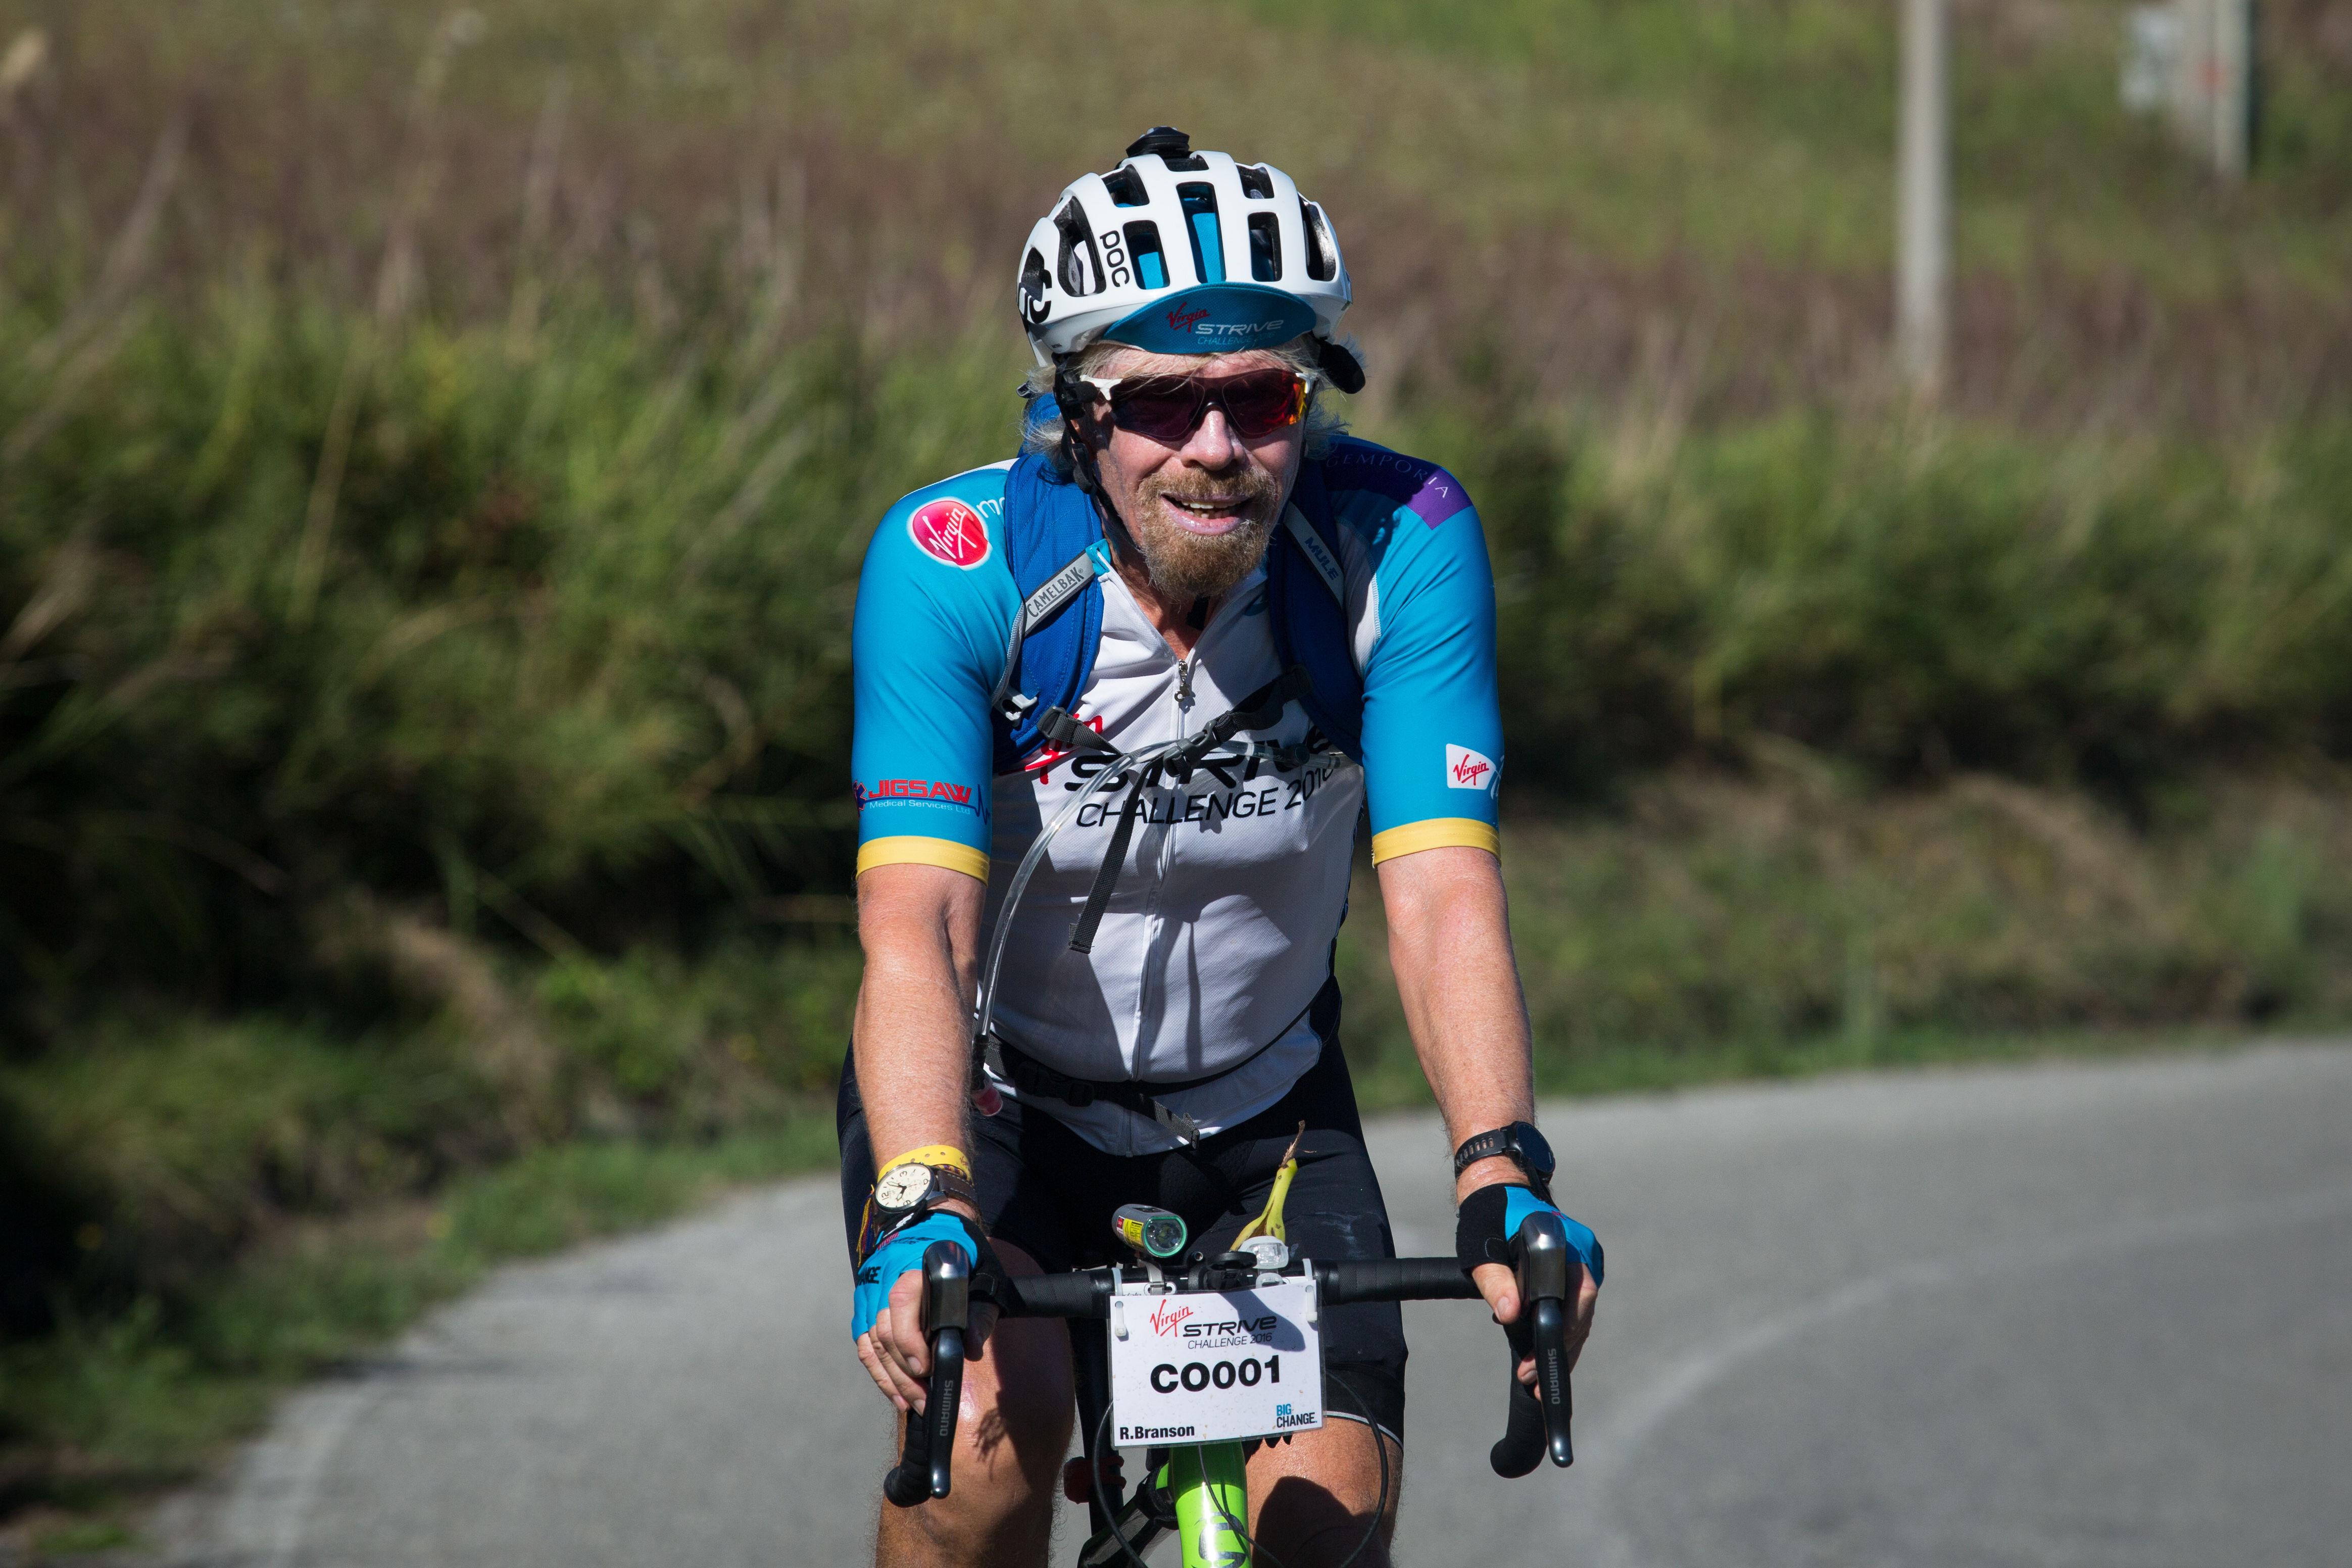 richard branson virgin strive challenge cycle